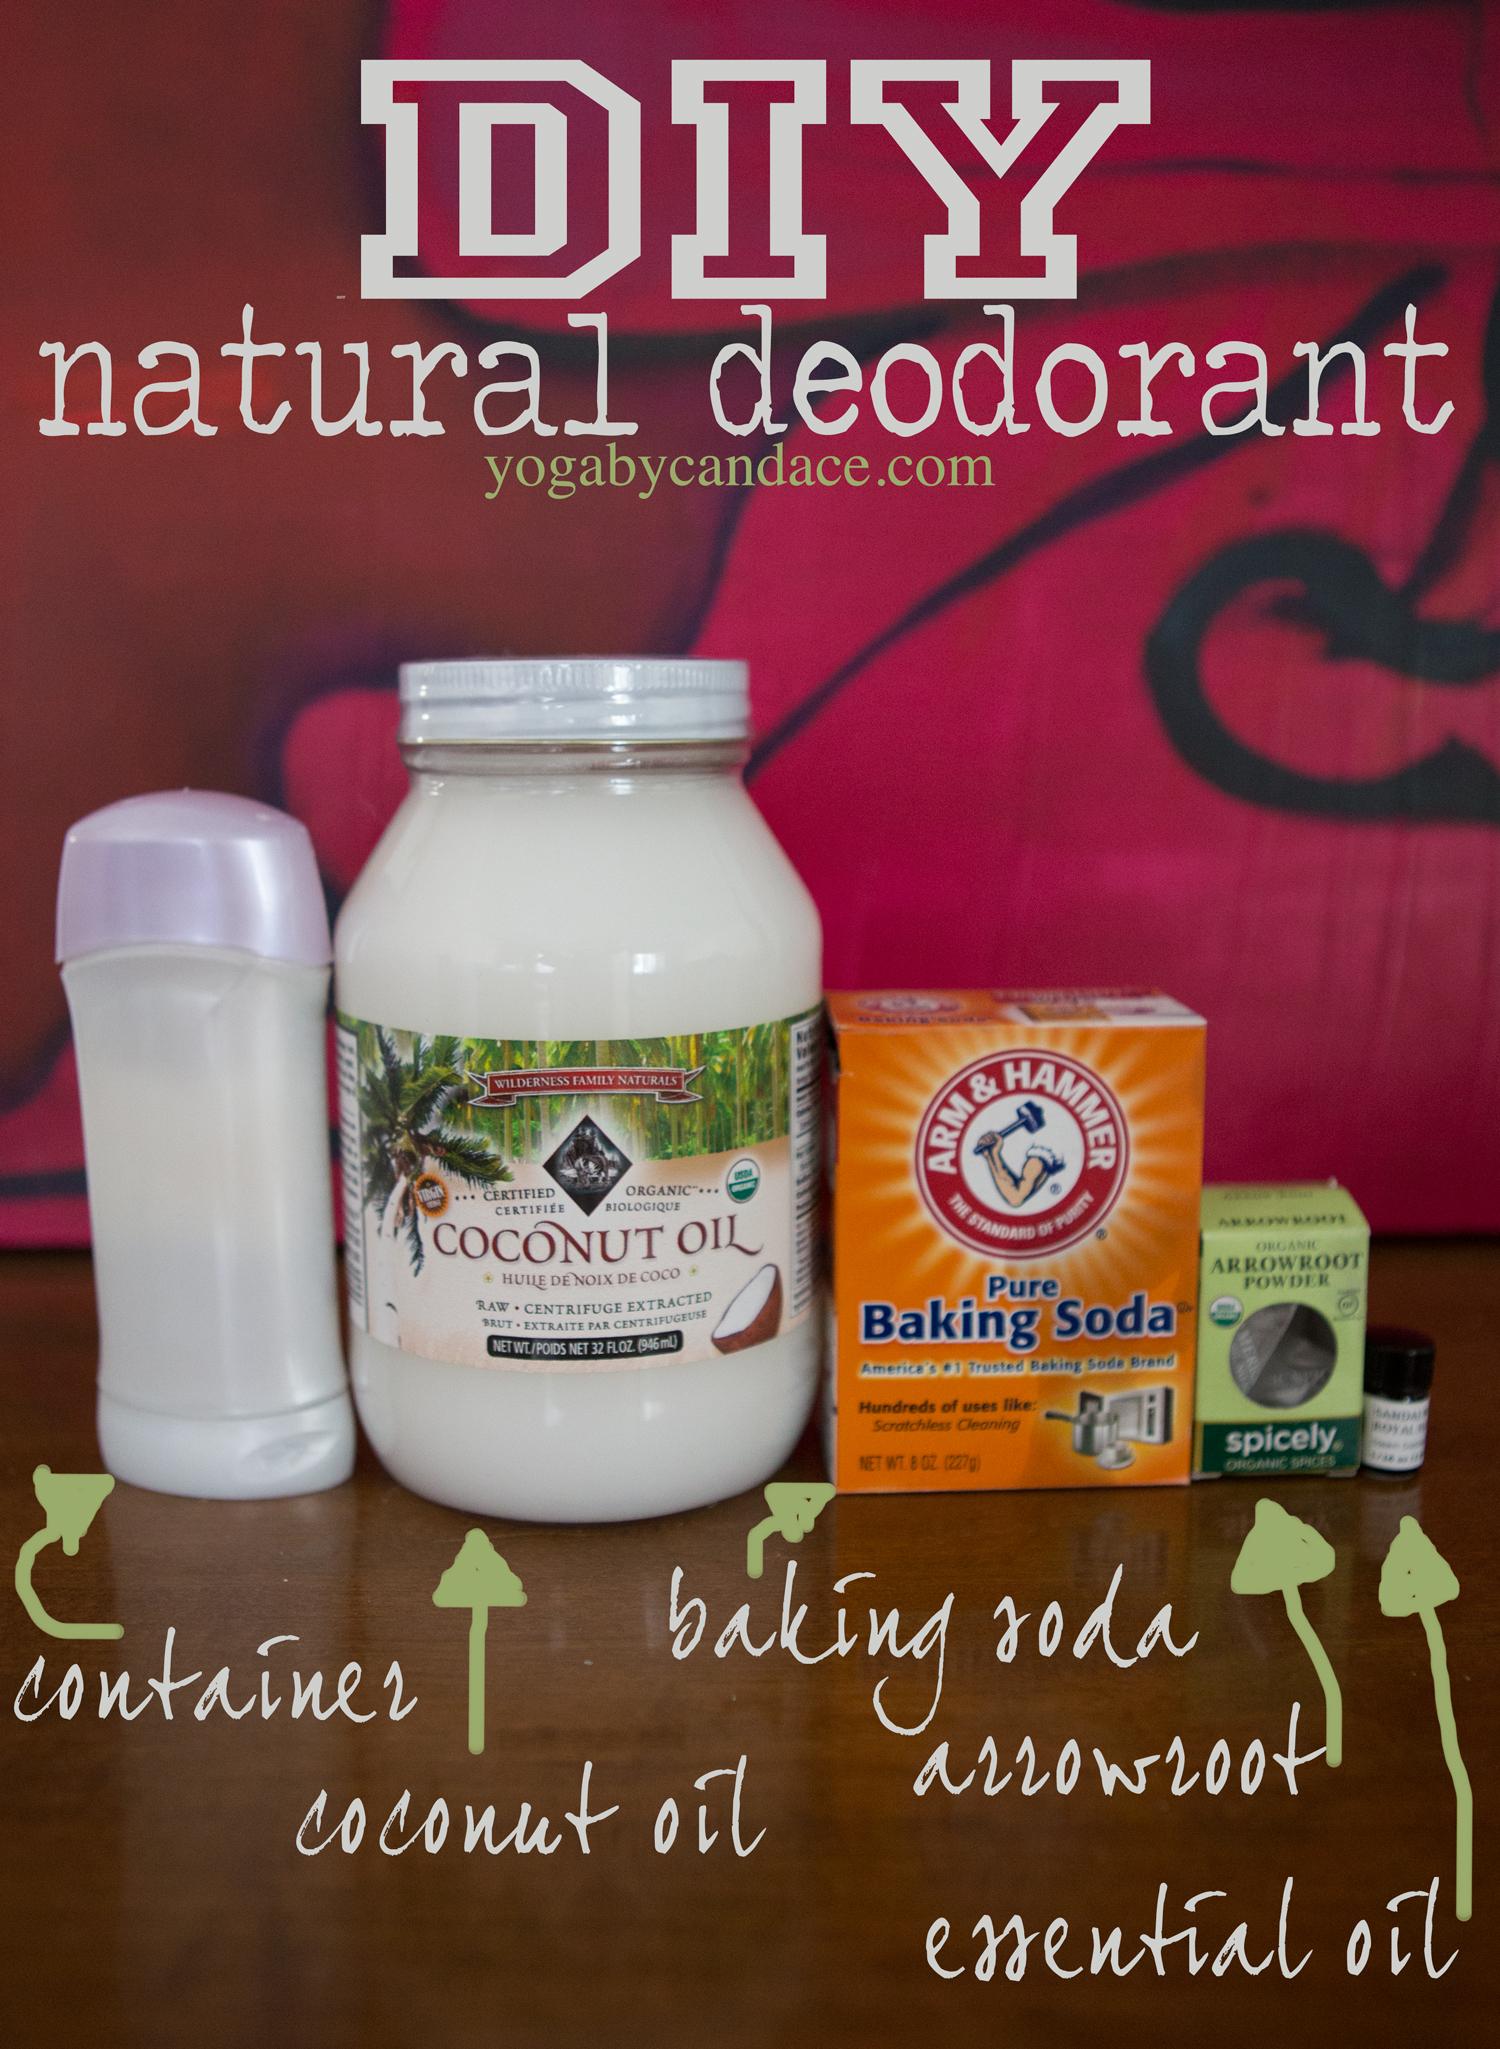 Pin it! DIY all natural deodorant  Using:  deodorant container ,  coconut oil ,  baking soda ,  arrowroot powder ,  essential oil